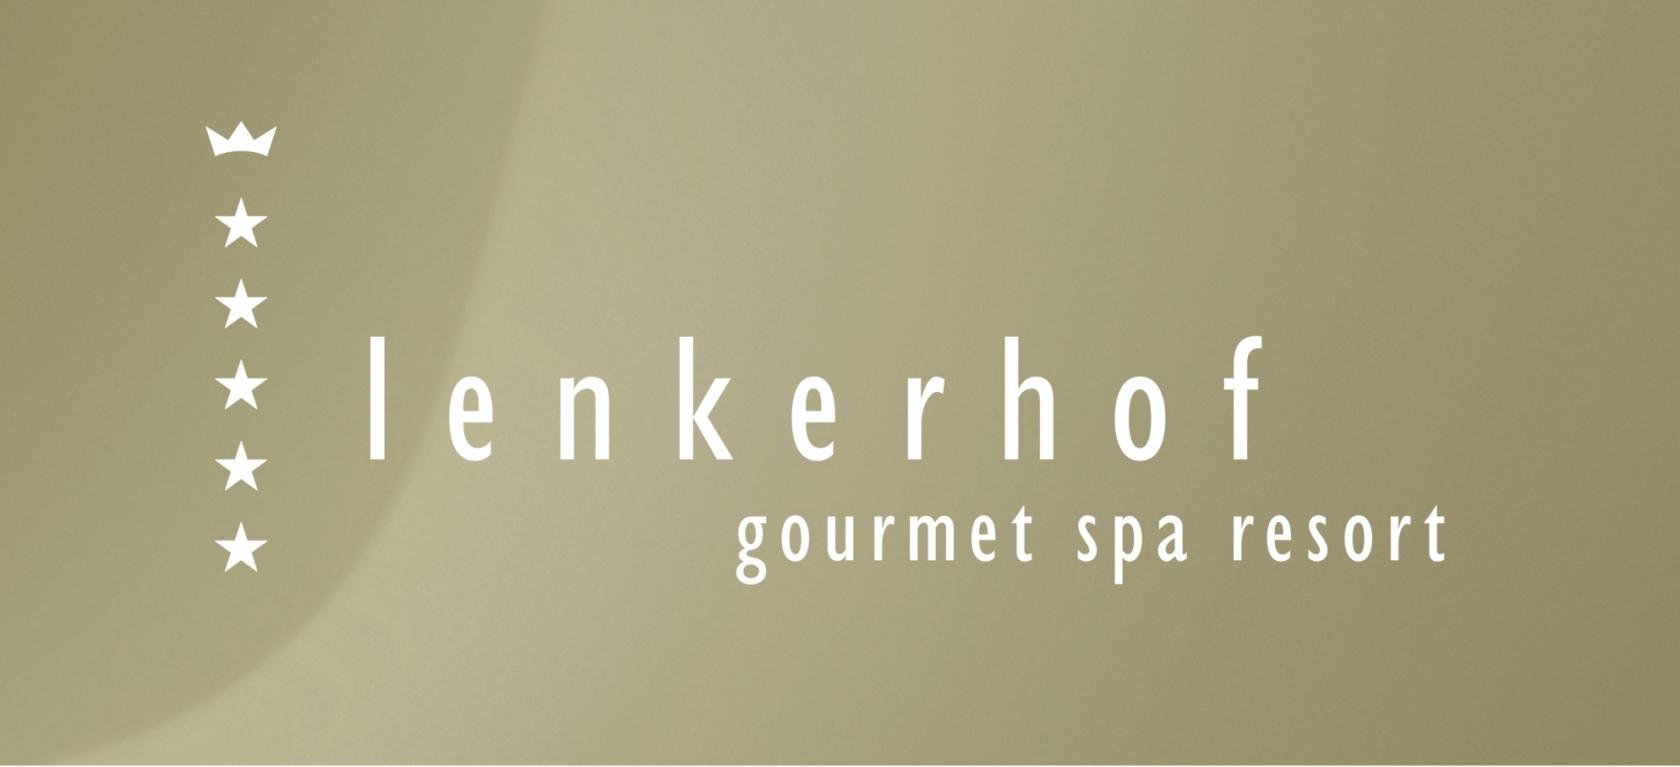 Lenkerhof - Original